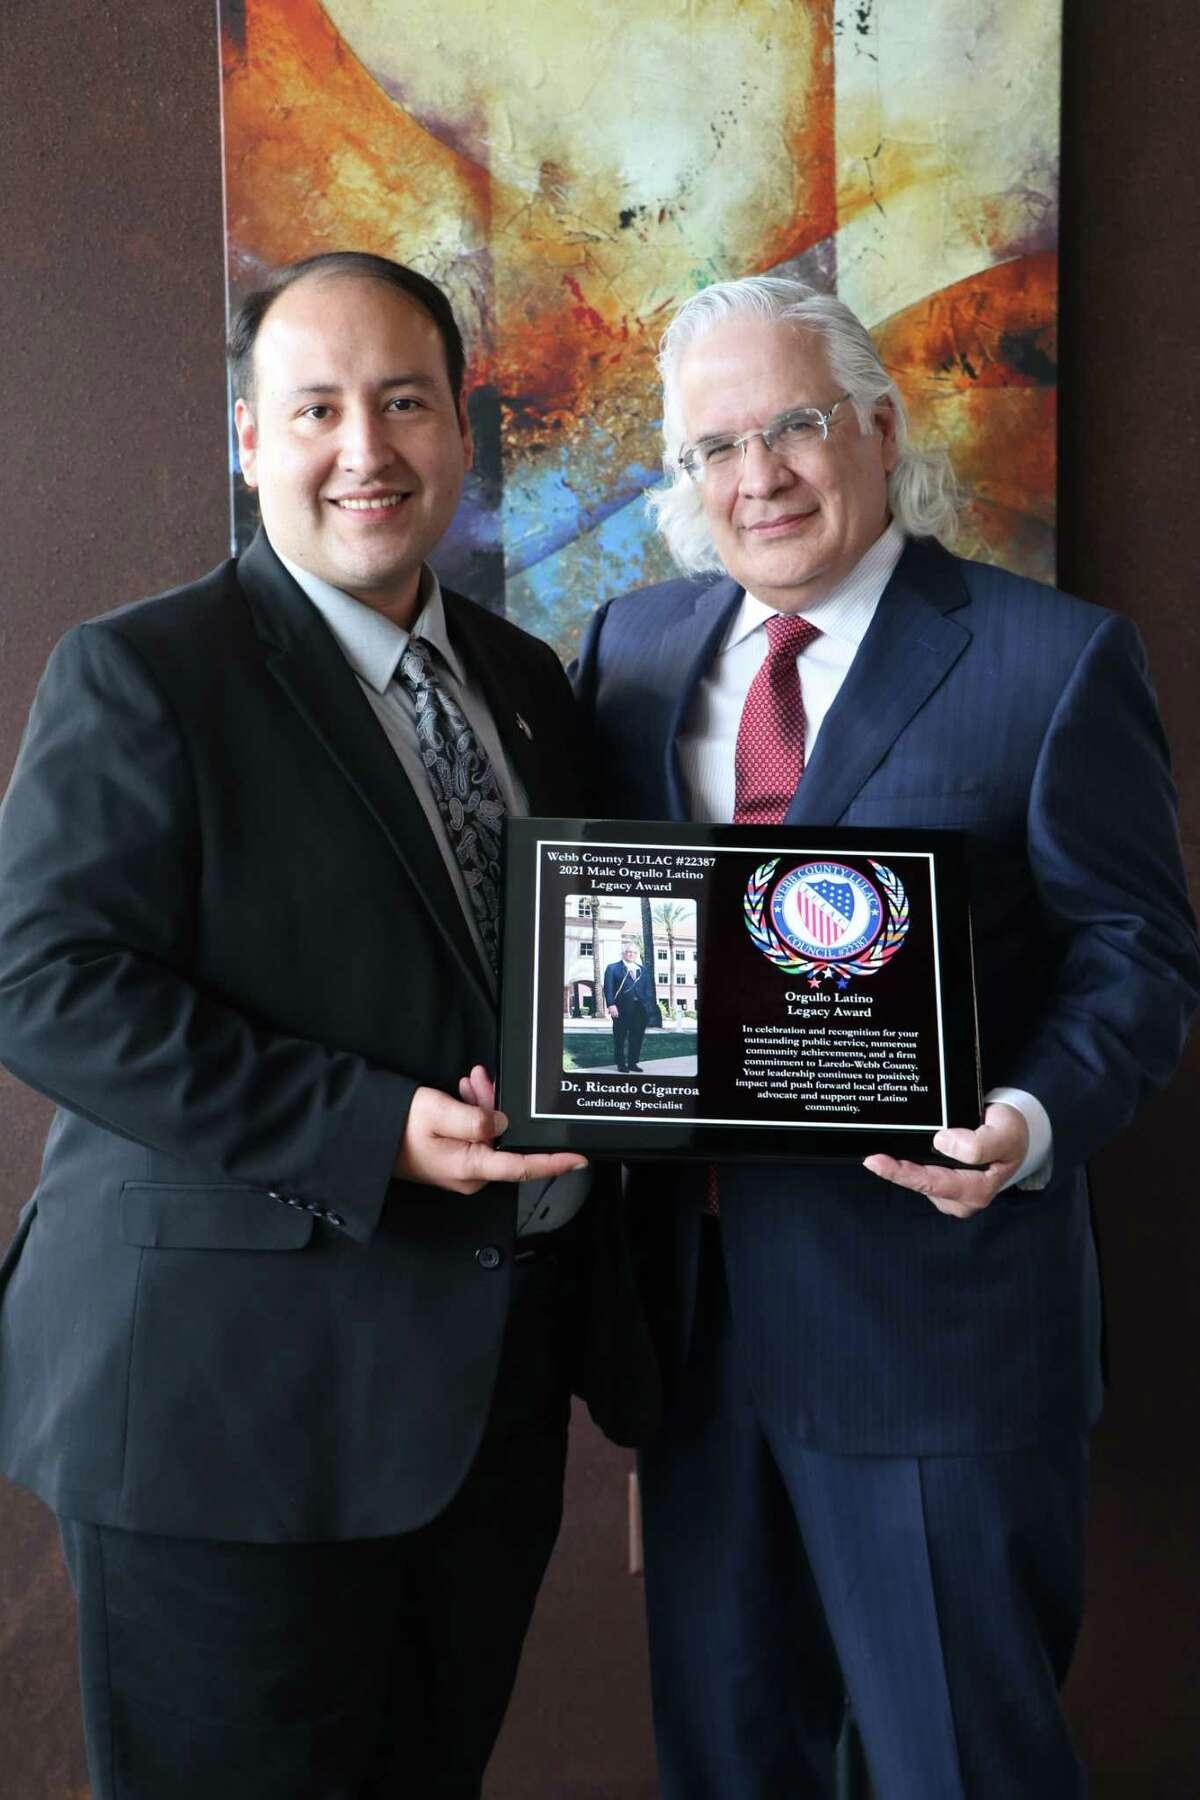 Dr. Ricardo Cigarroa is the 2021 Male Orgullo Latino Legacy Award winner.